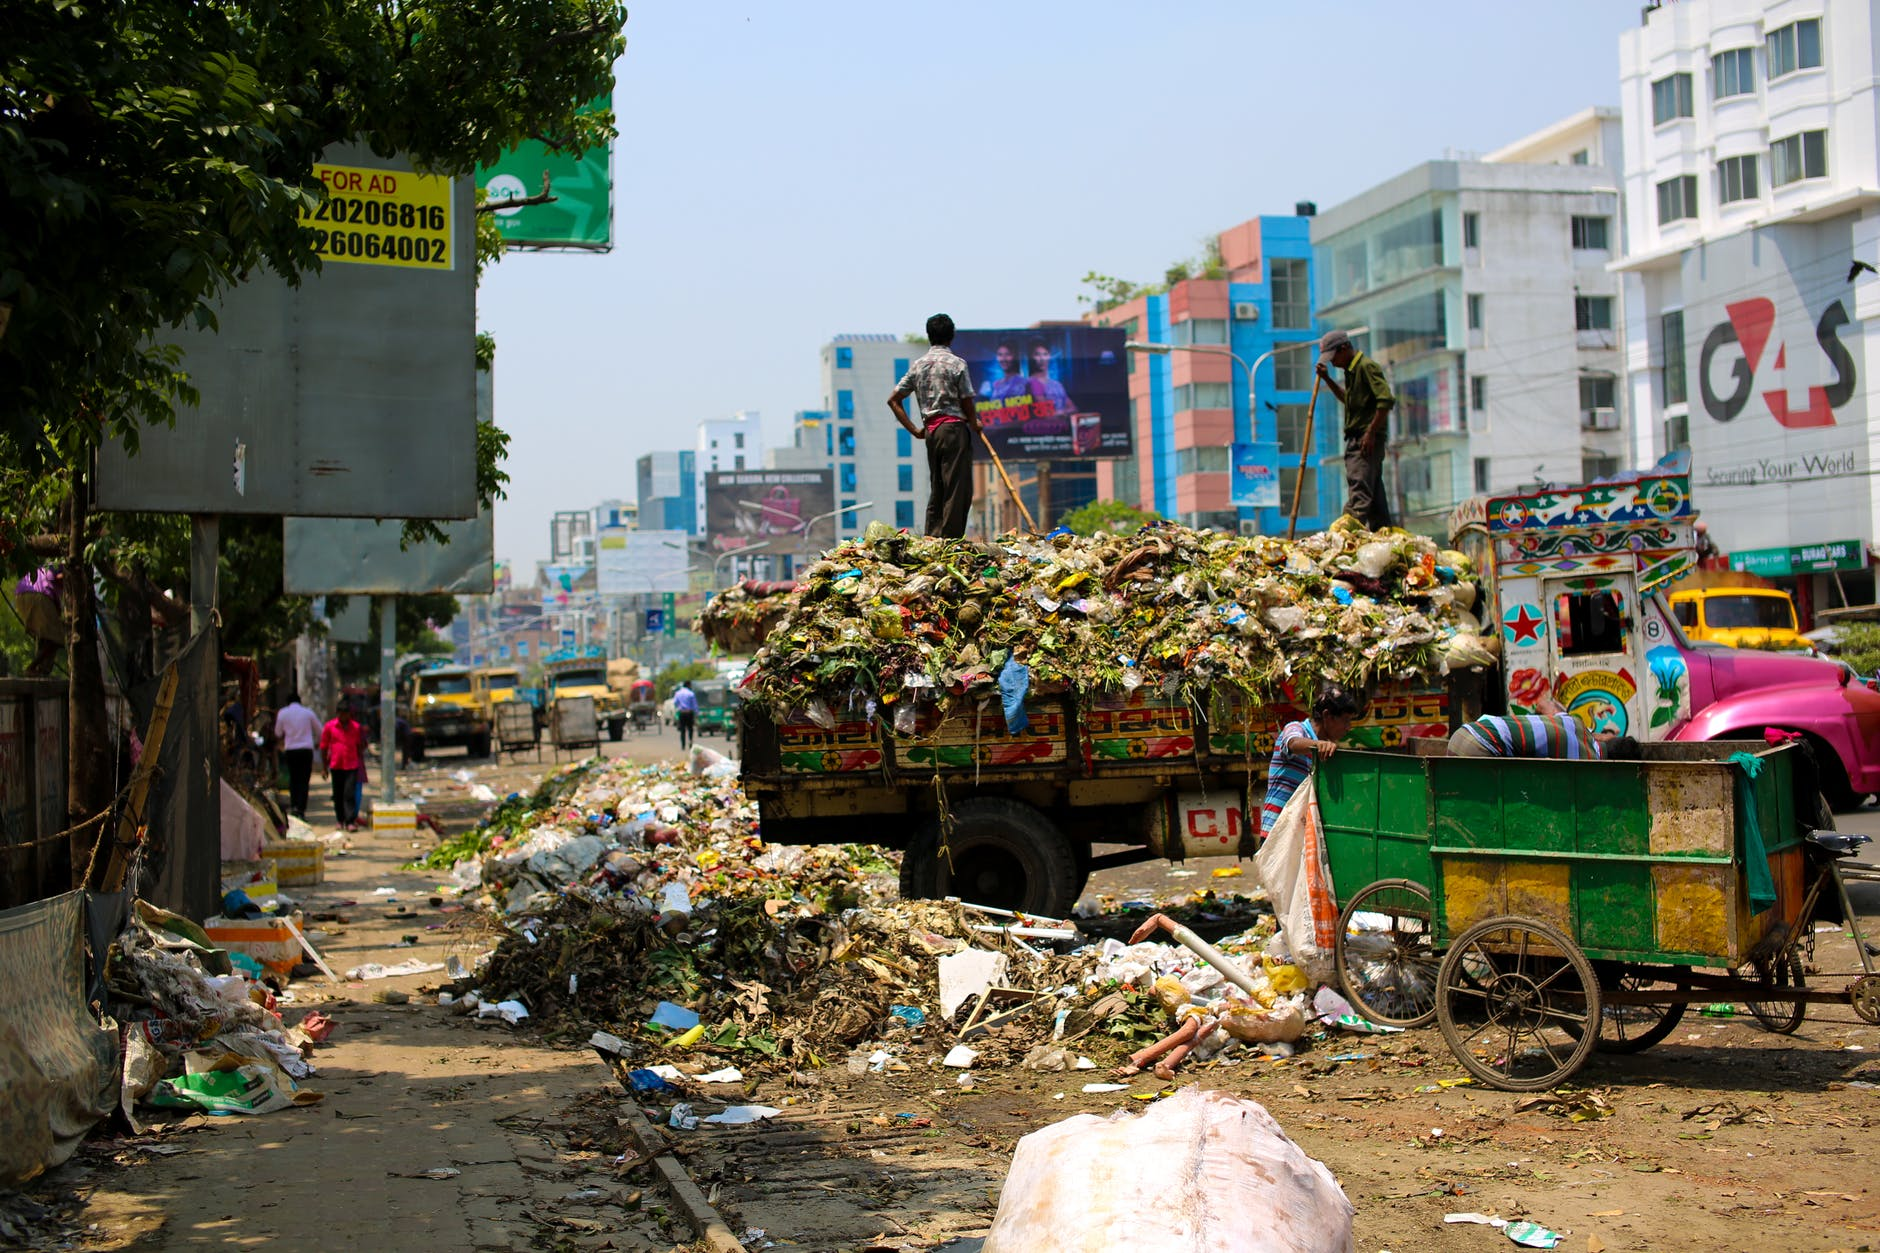 photo of a dump truck across buildings